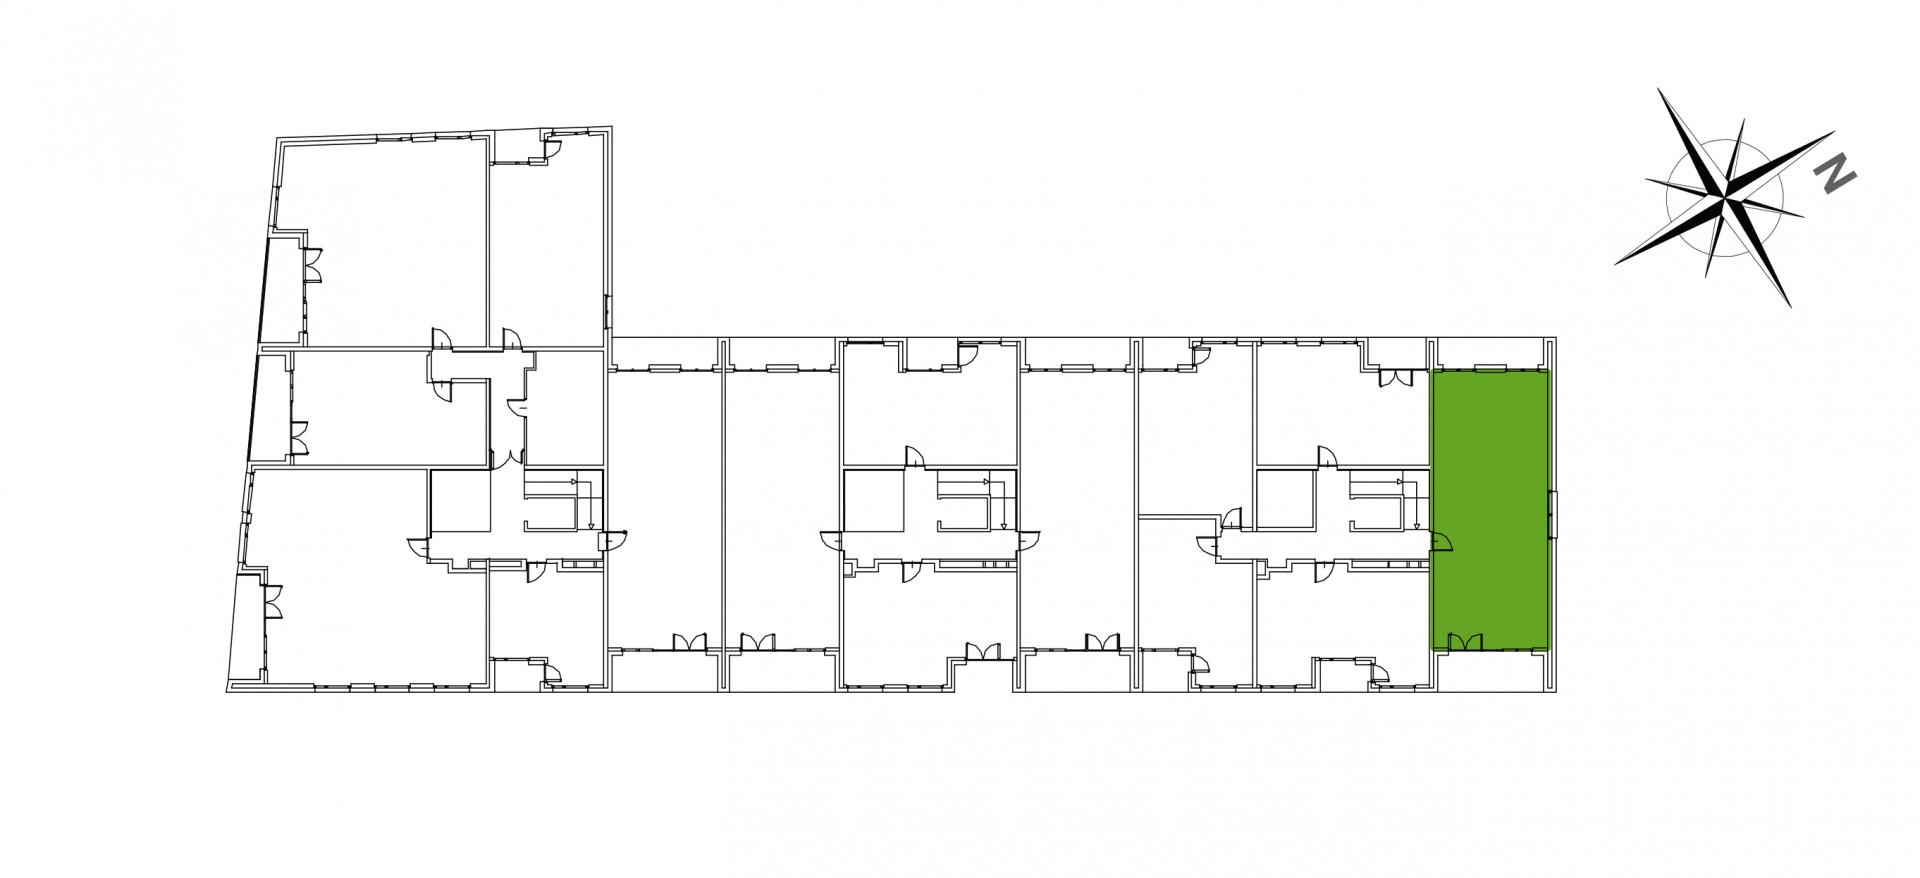 Mazowiecka 72 / apartament nr 9 rzut 2